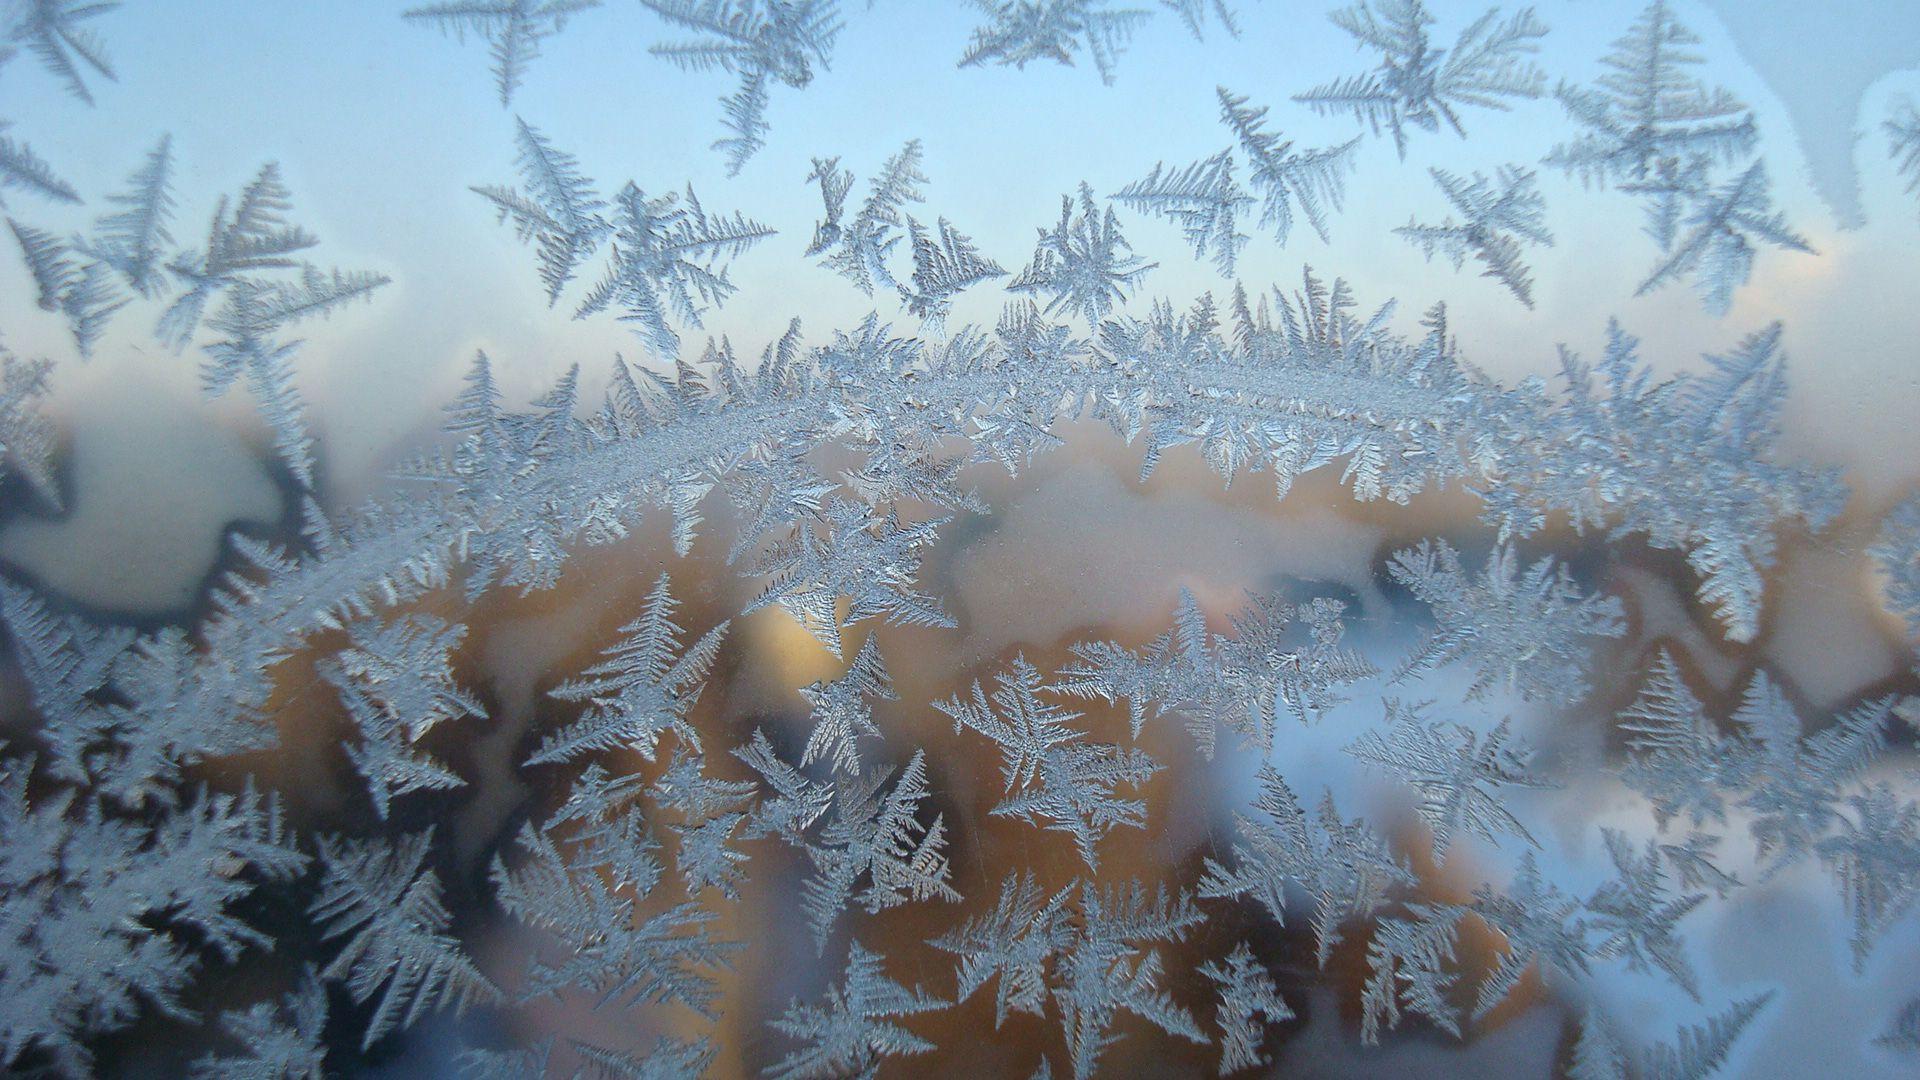 Winter Patterns On The Window hd wallpaper for laptop